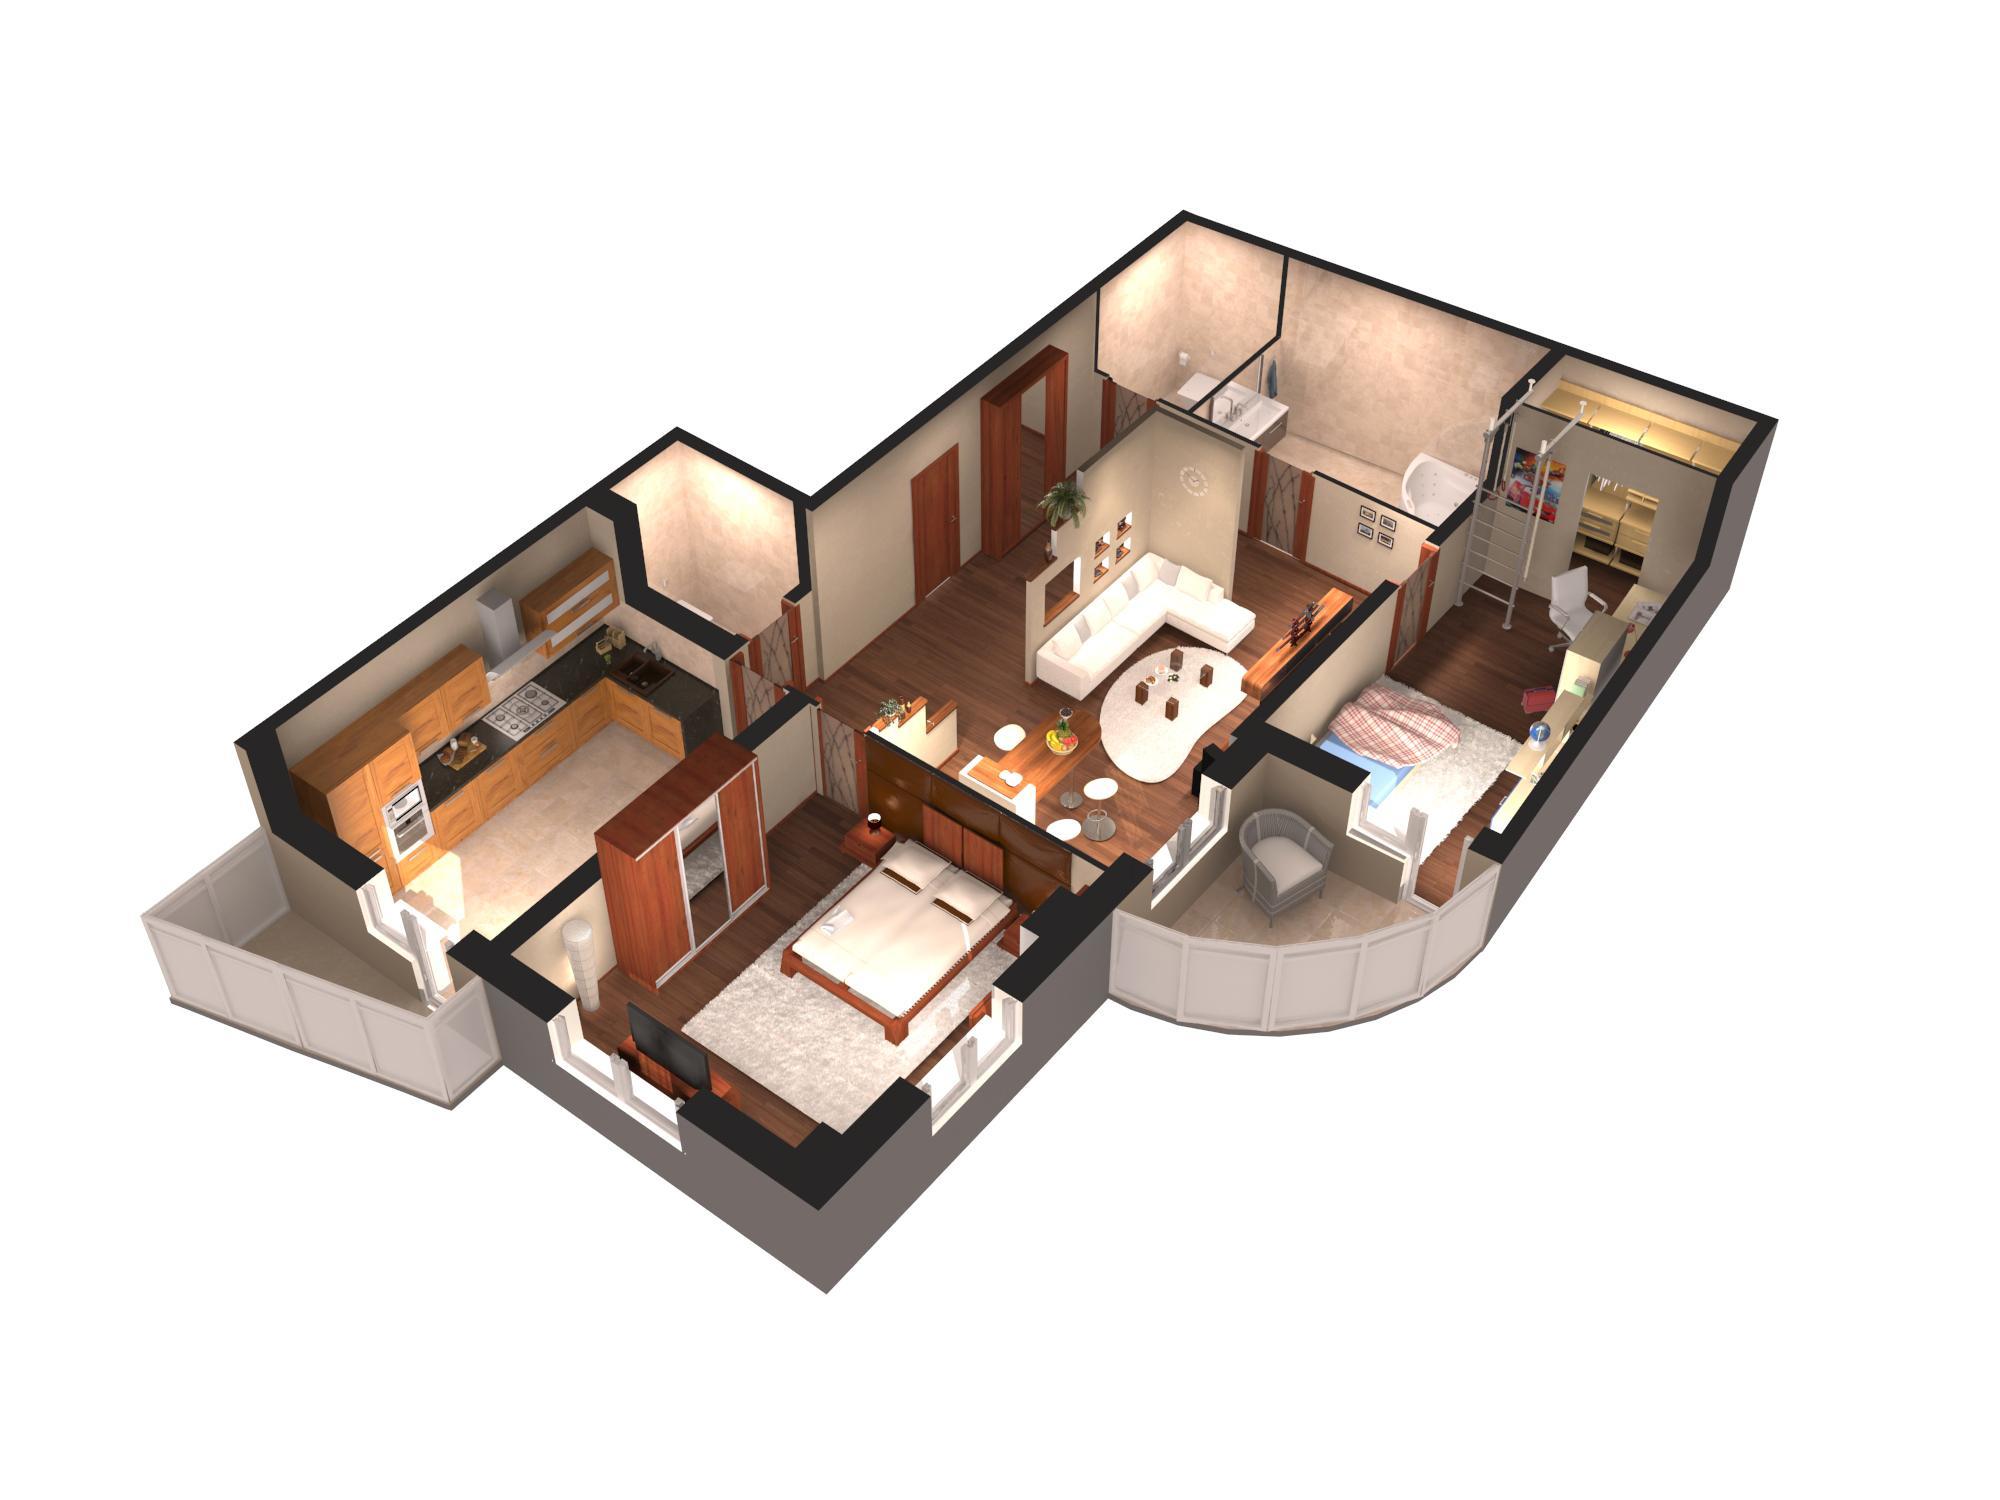 Дизайн проекты трехкомнатных квартир фото